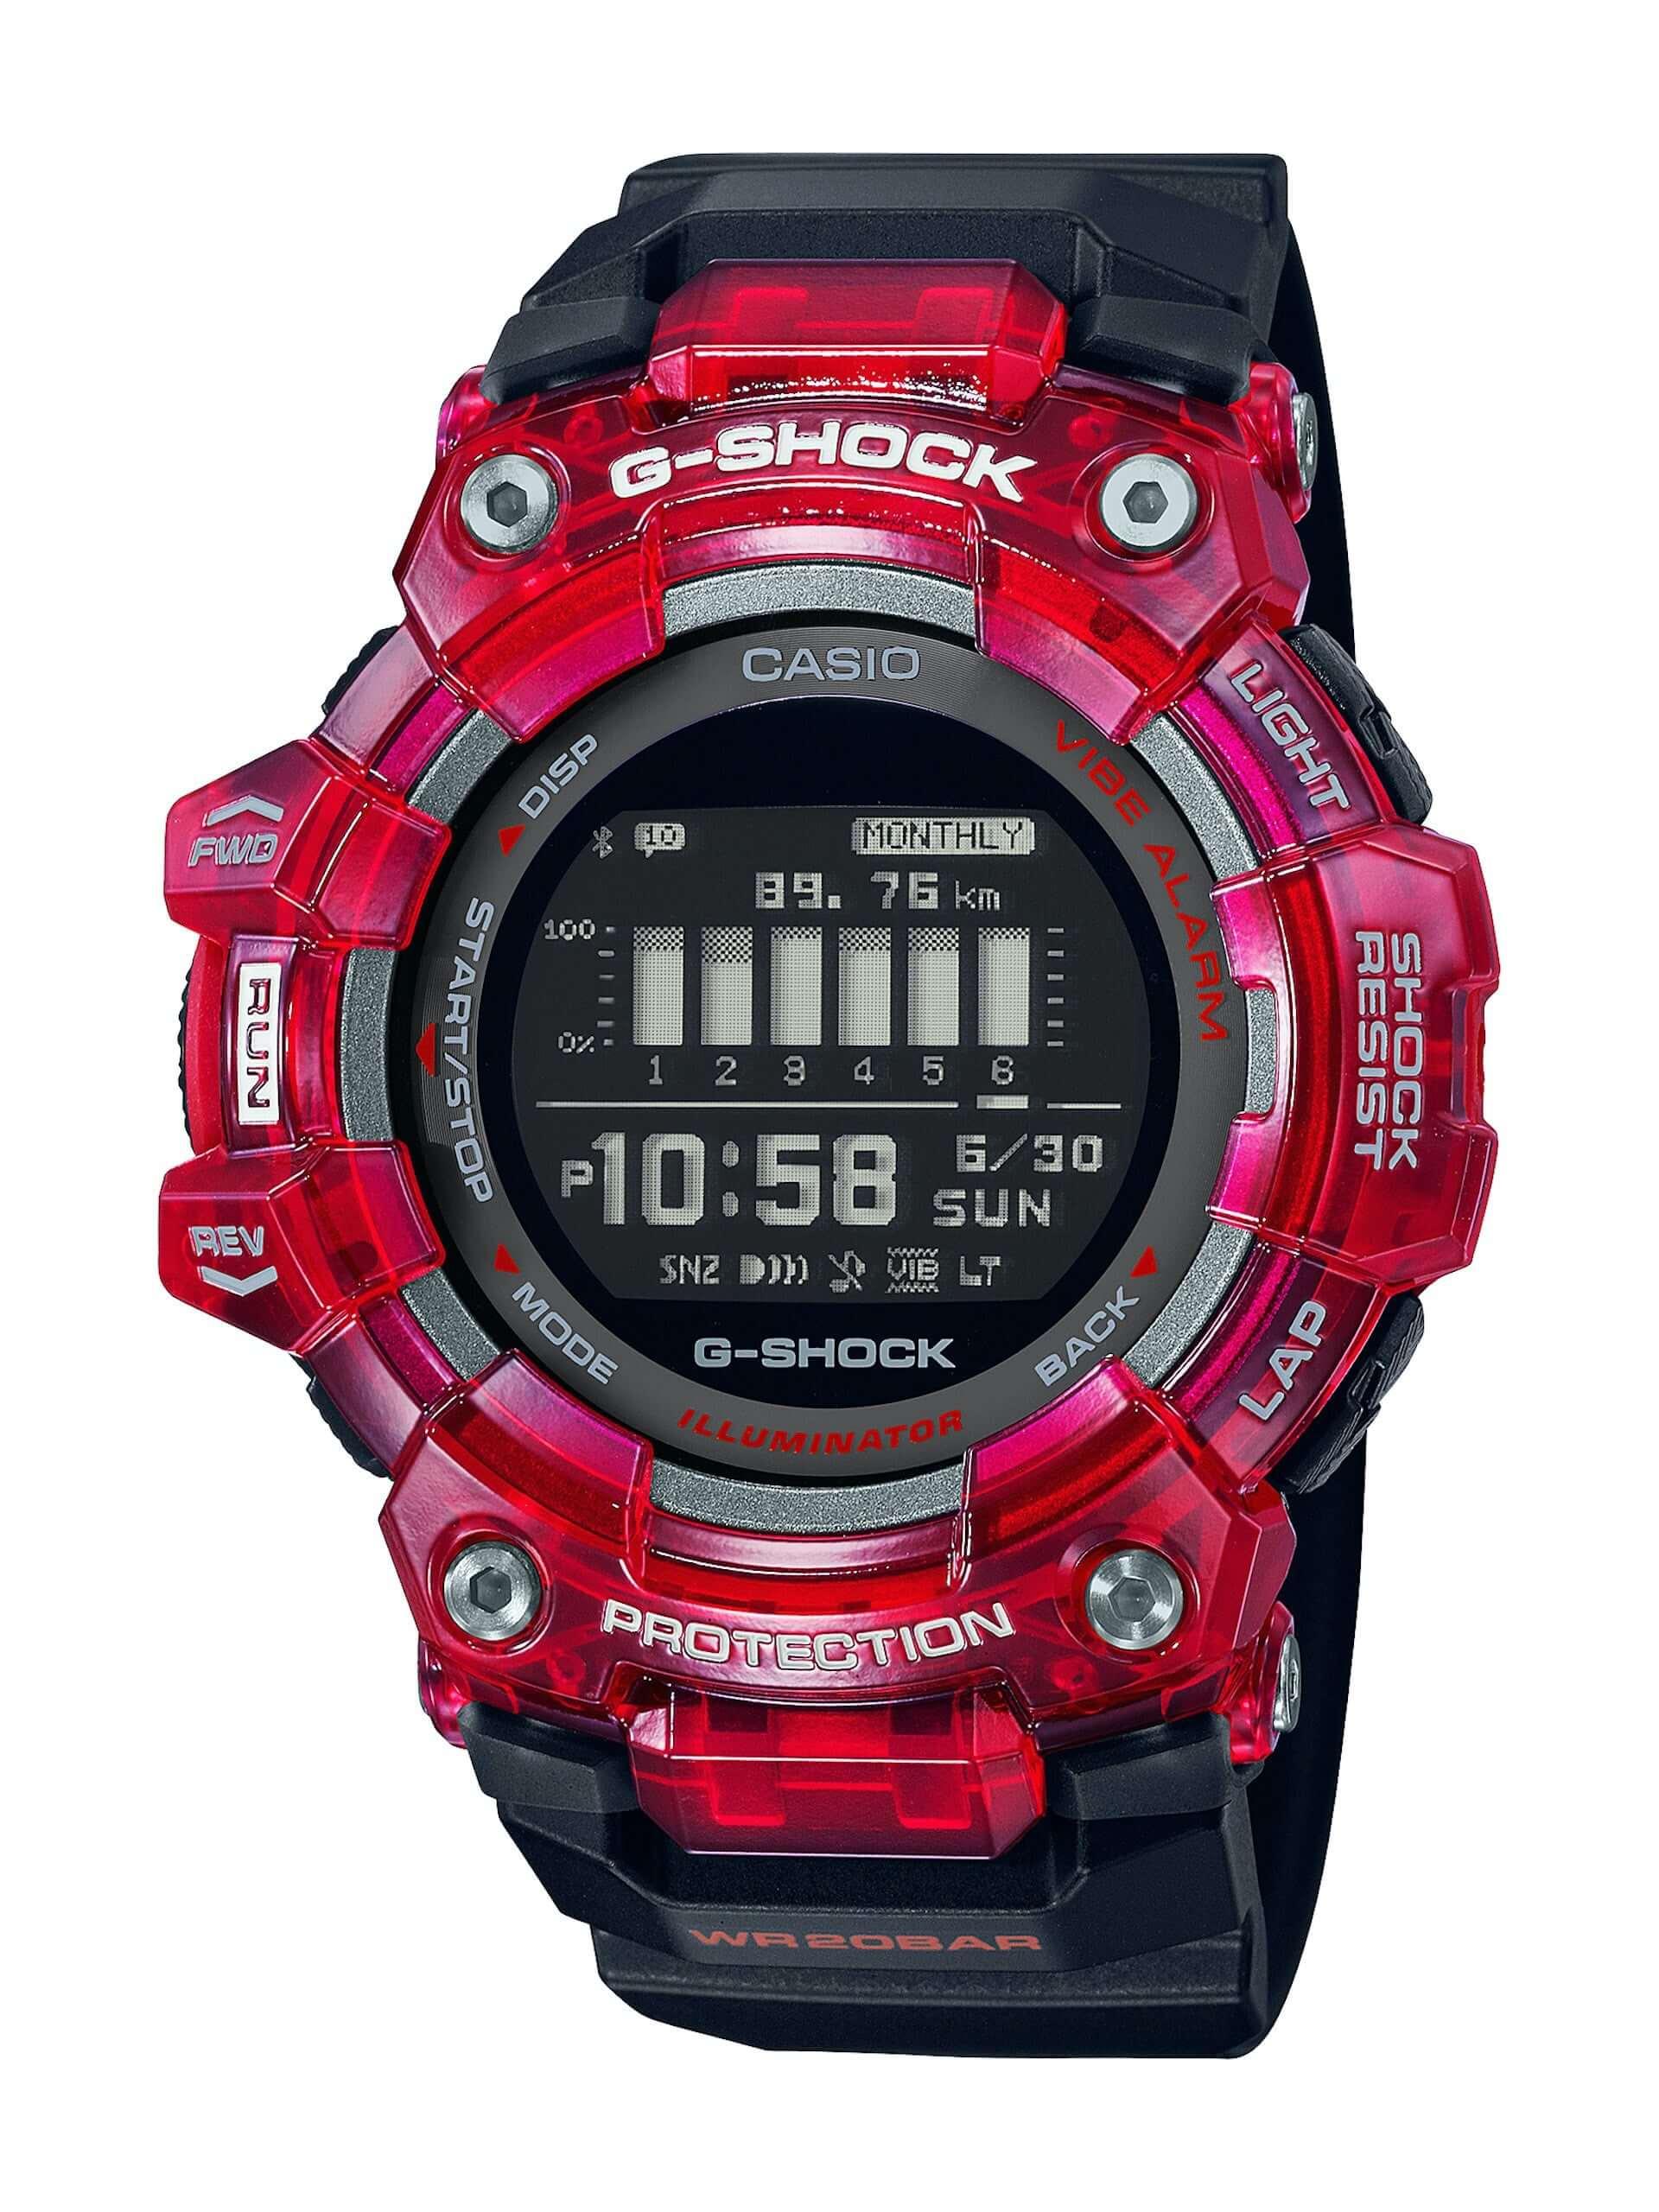 CASIOからG-SHOCK『GBD-100』『GMW-B5000』の新色やPRO TREK『PRG-240』の新モデルなど続々登場!1月発売の新製品ラインナップが発表 tech210118_casio_6-1920x2560